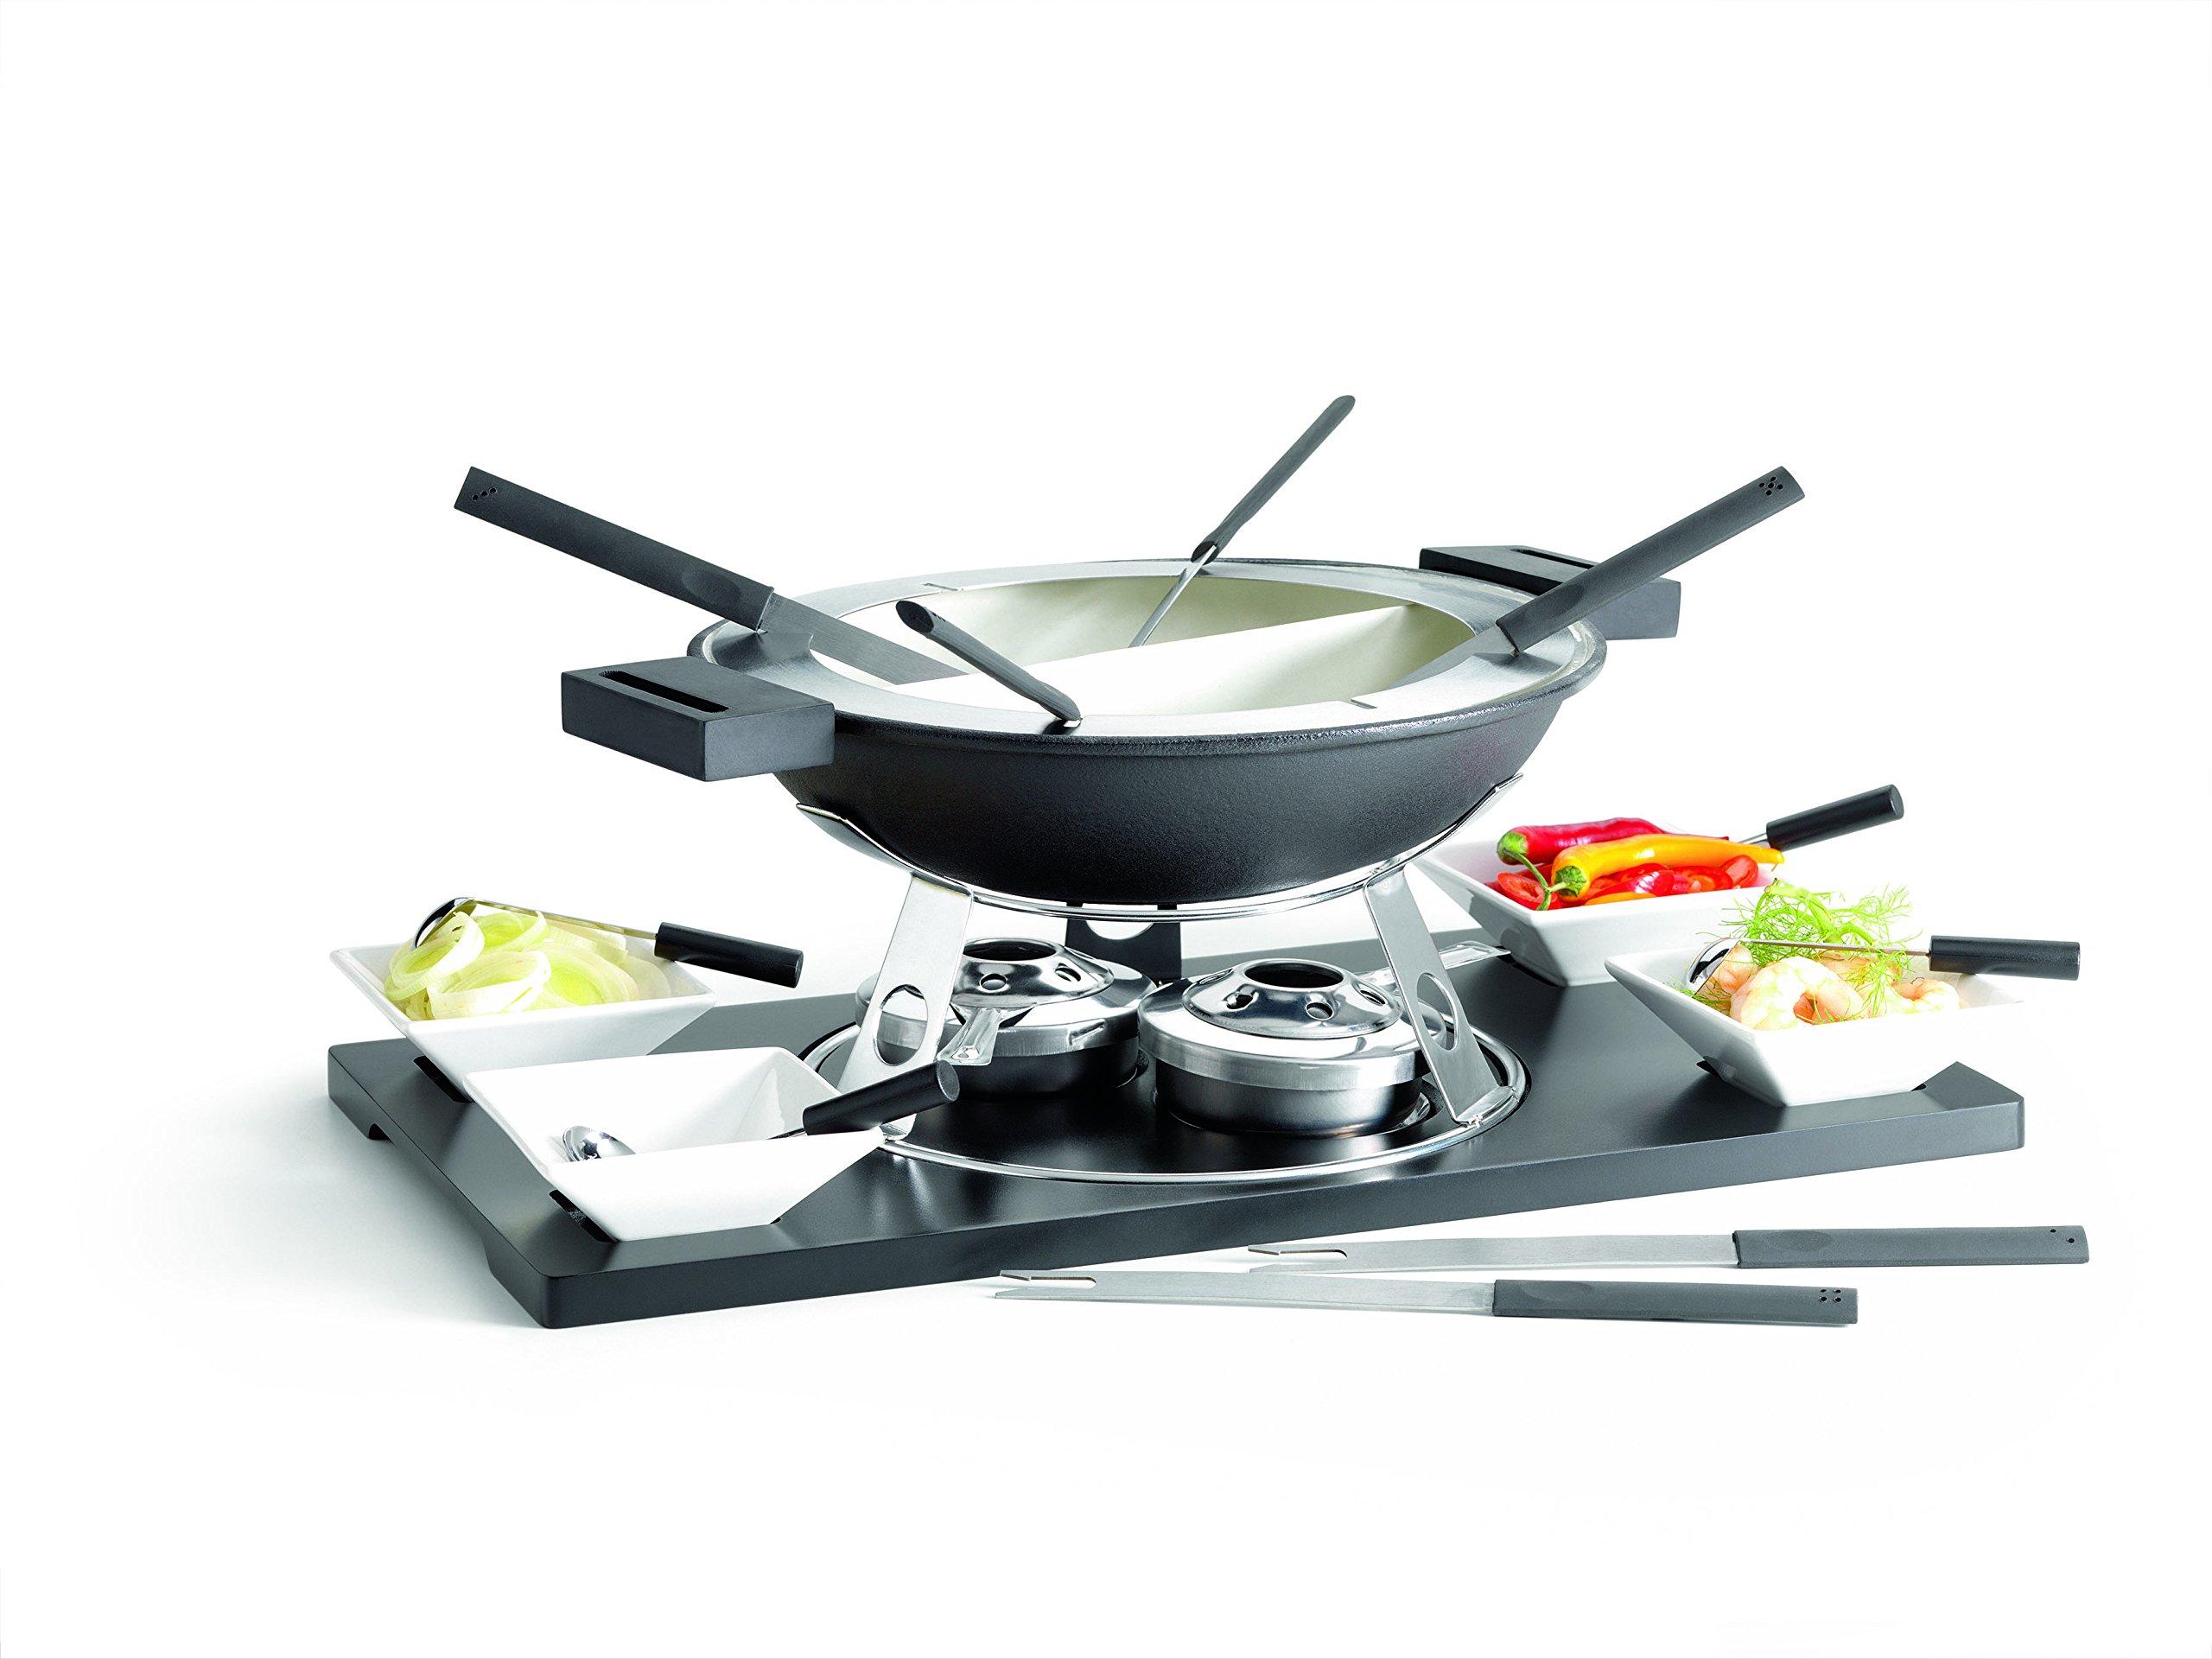 Domestic 20-Piece Fondue Set including 1-MDF Platter/ Rechaud/ Fondue Pot and Fork Holder/ 2-Burner, 4-Bowls...